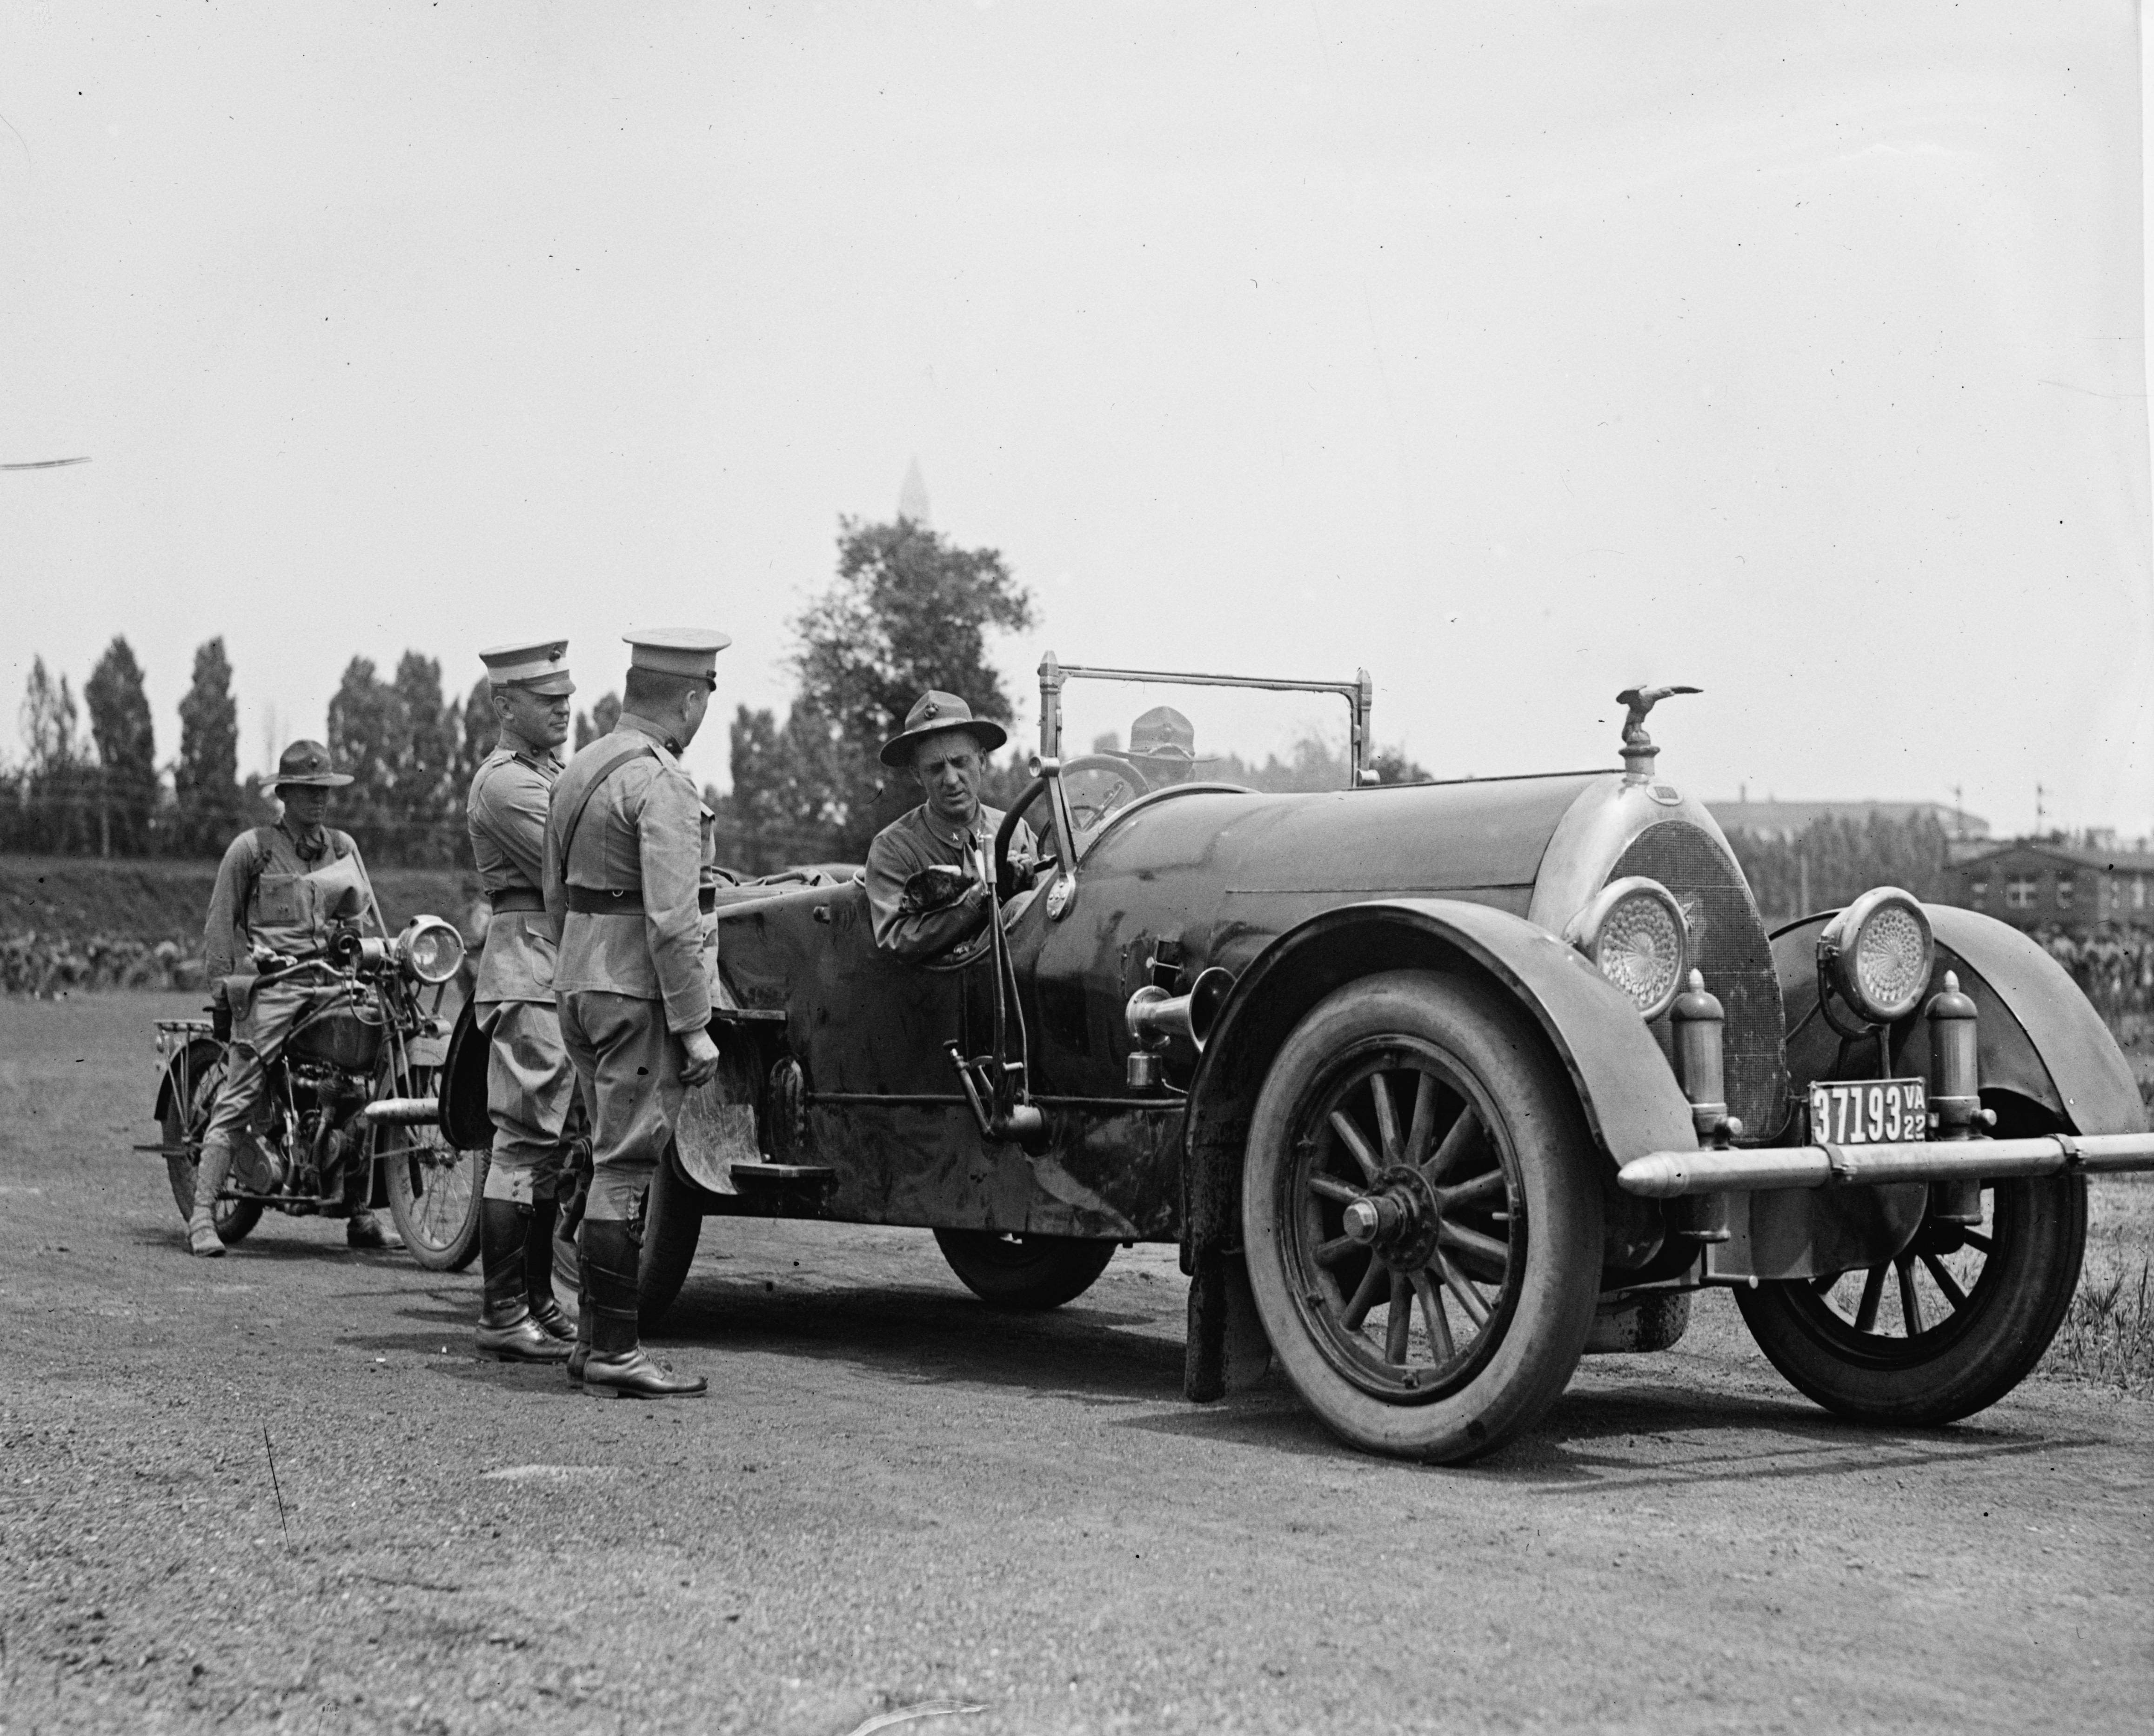 filesmedley d butler at gettysburg pennsylvania in 1922